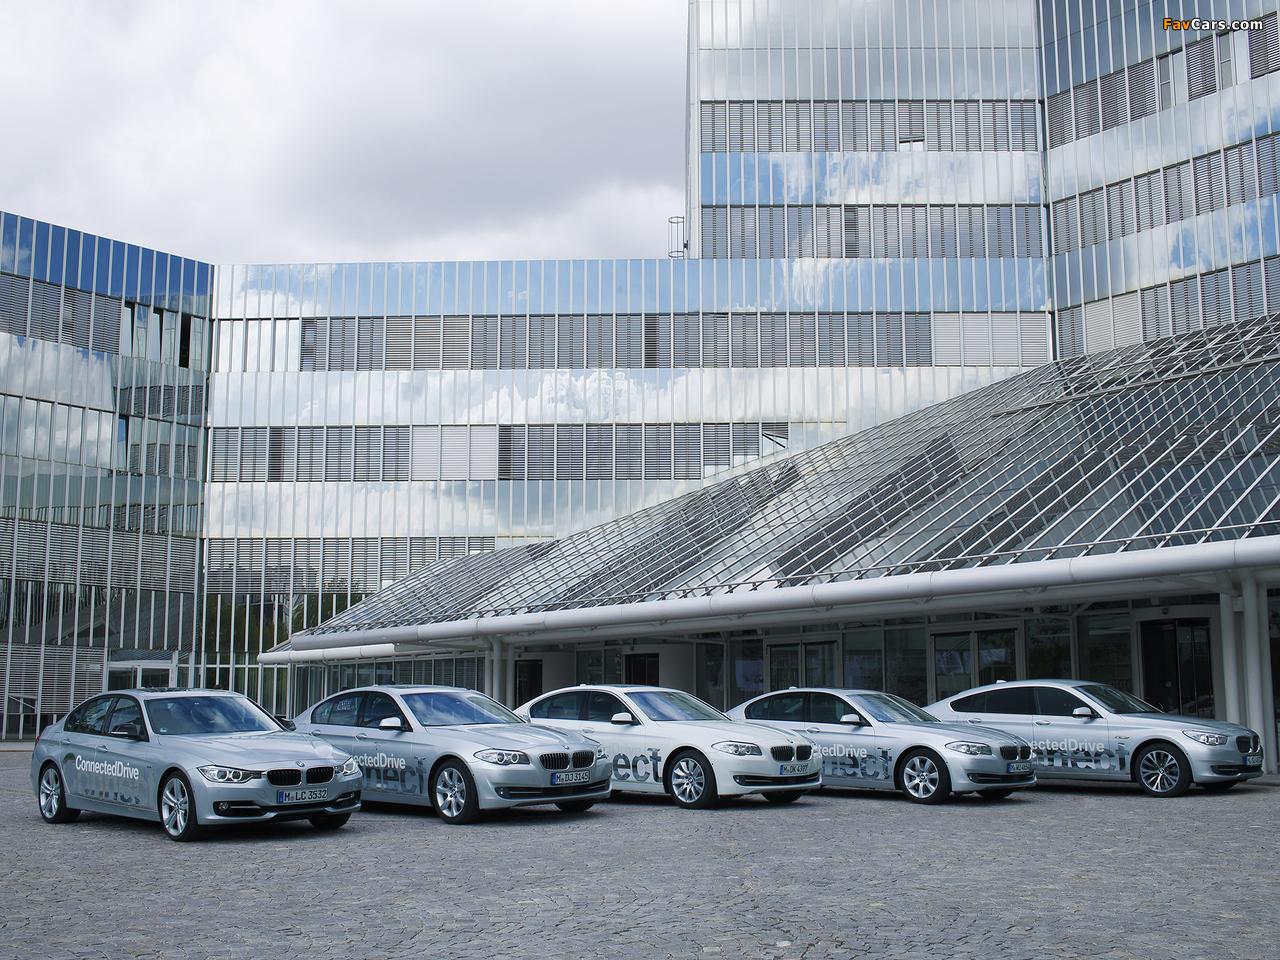 BMW images (1280 x 960)